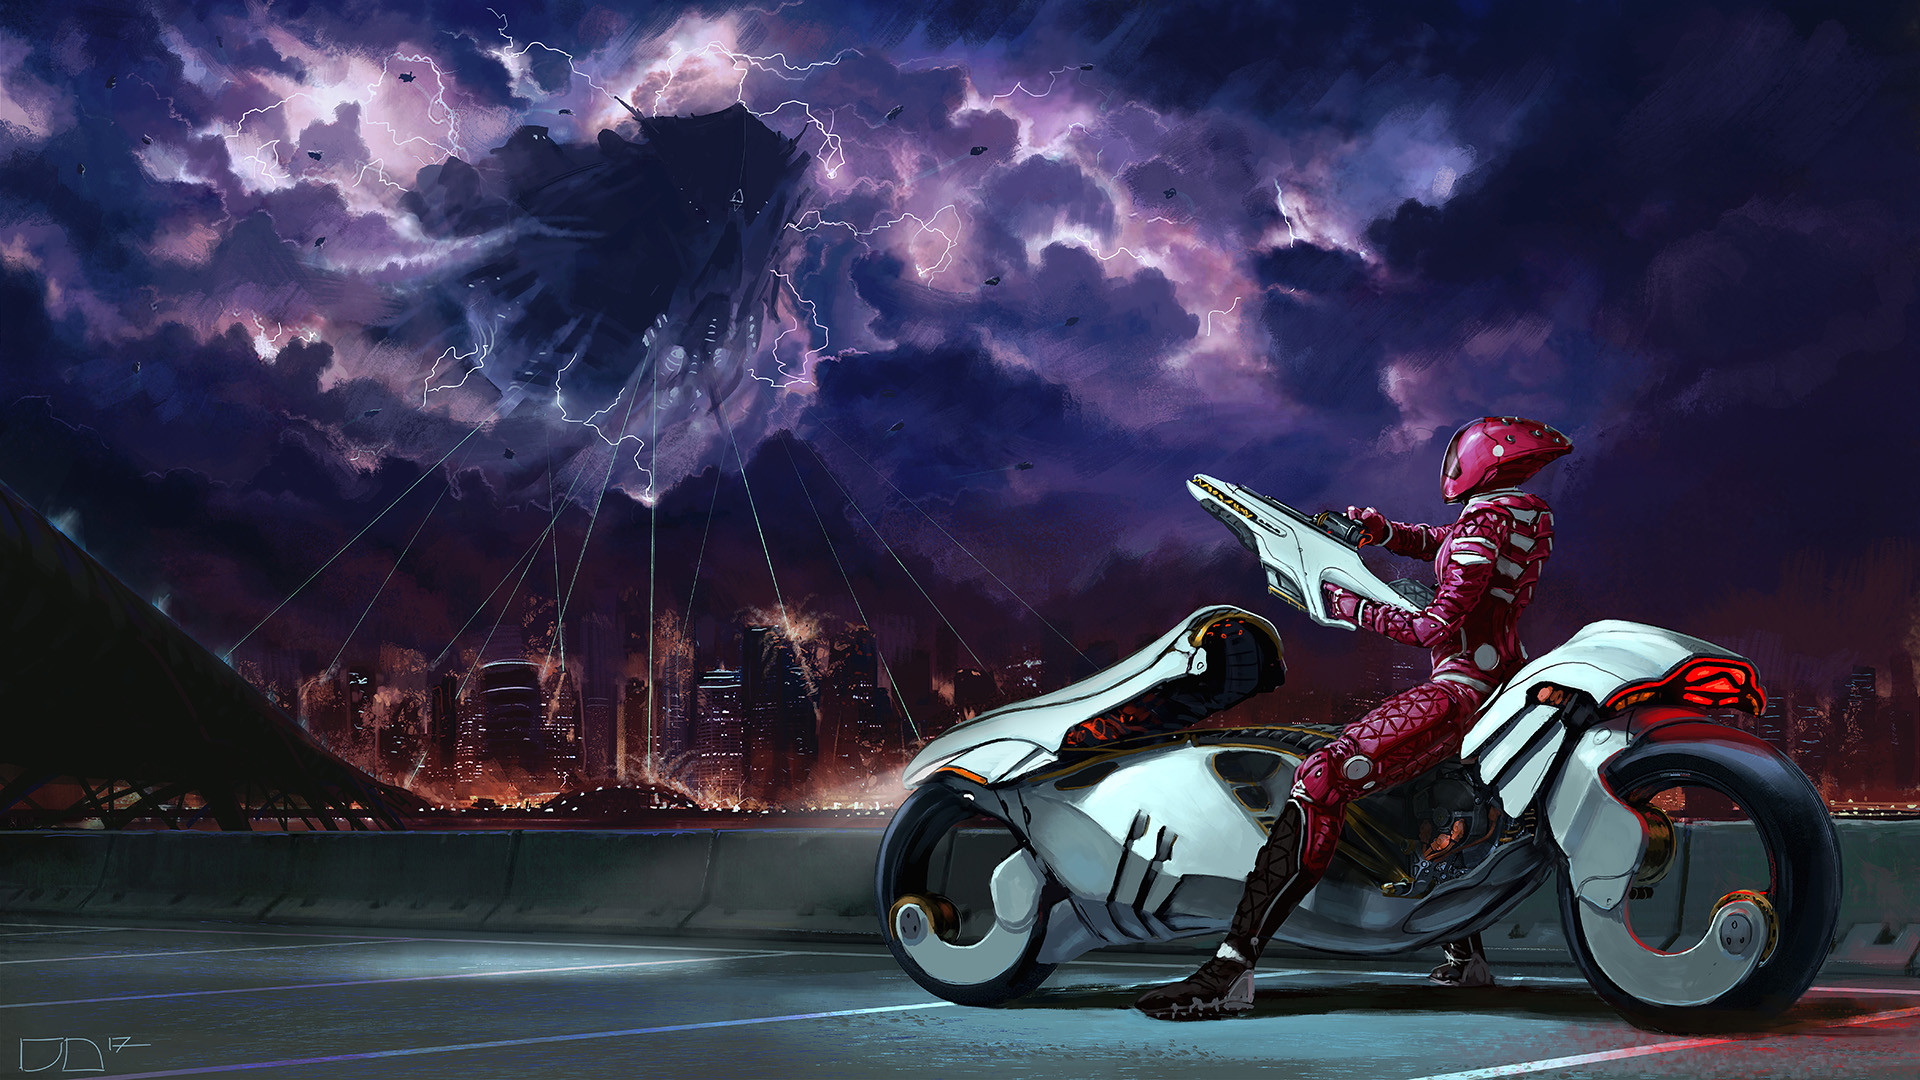 Alien City Cloud Futuristic Space Invasion Vehicle Warrior Weapon 1920x1080